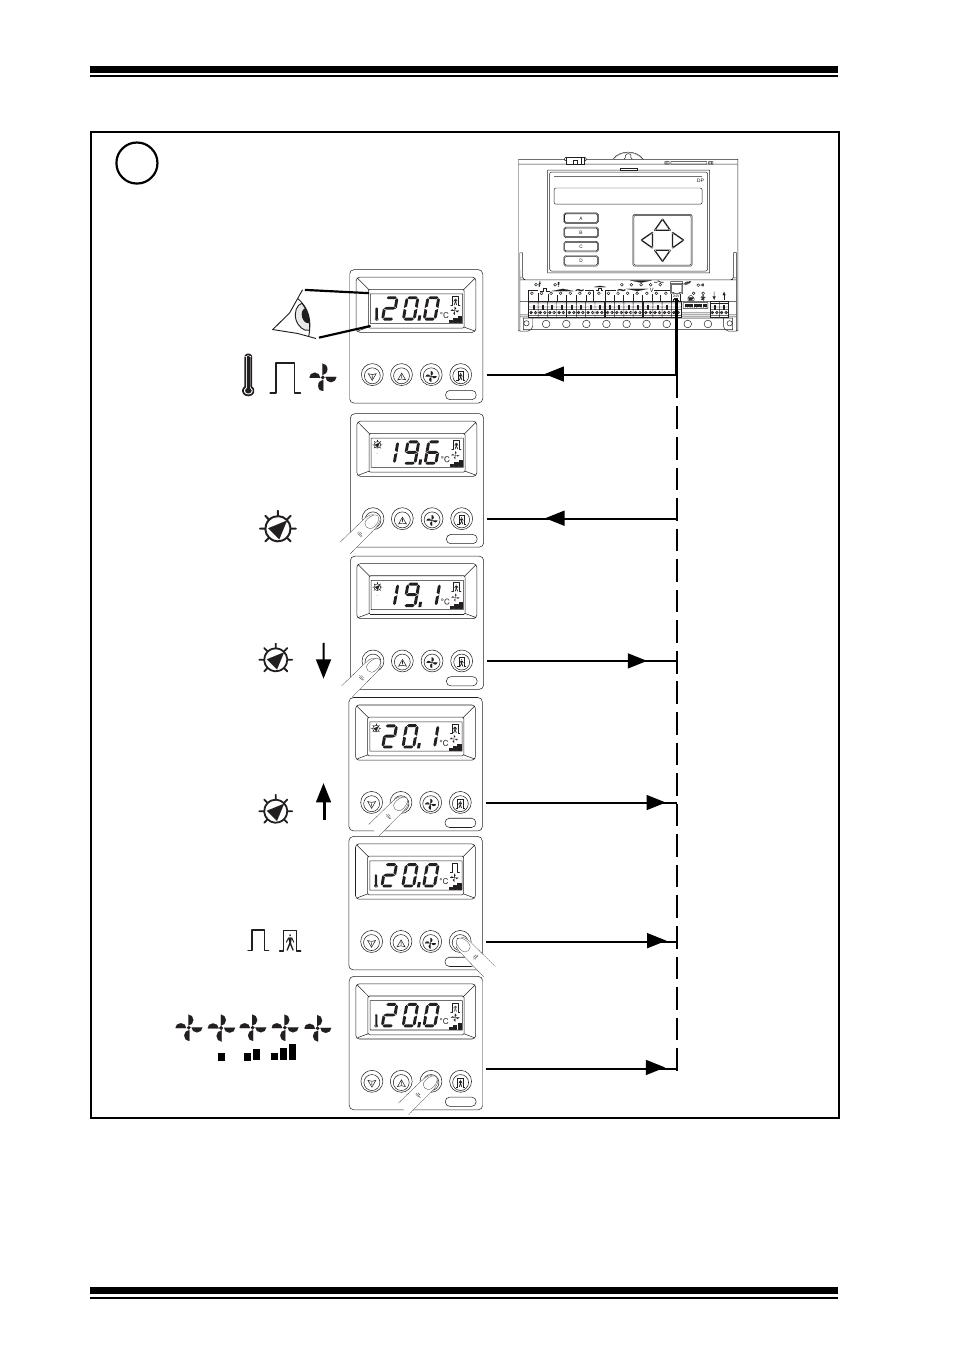 rd iq installation instructions installation check system trend rh manualsdir com iq-rm user manual iq-rm user manual